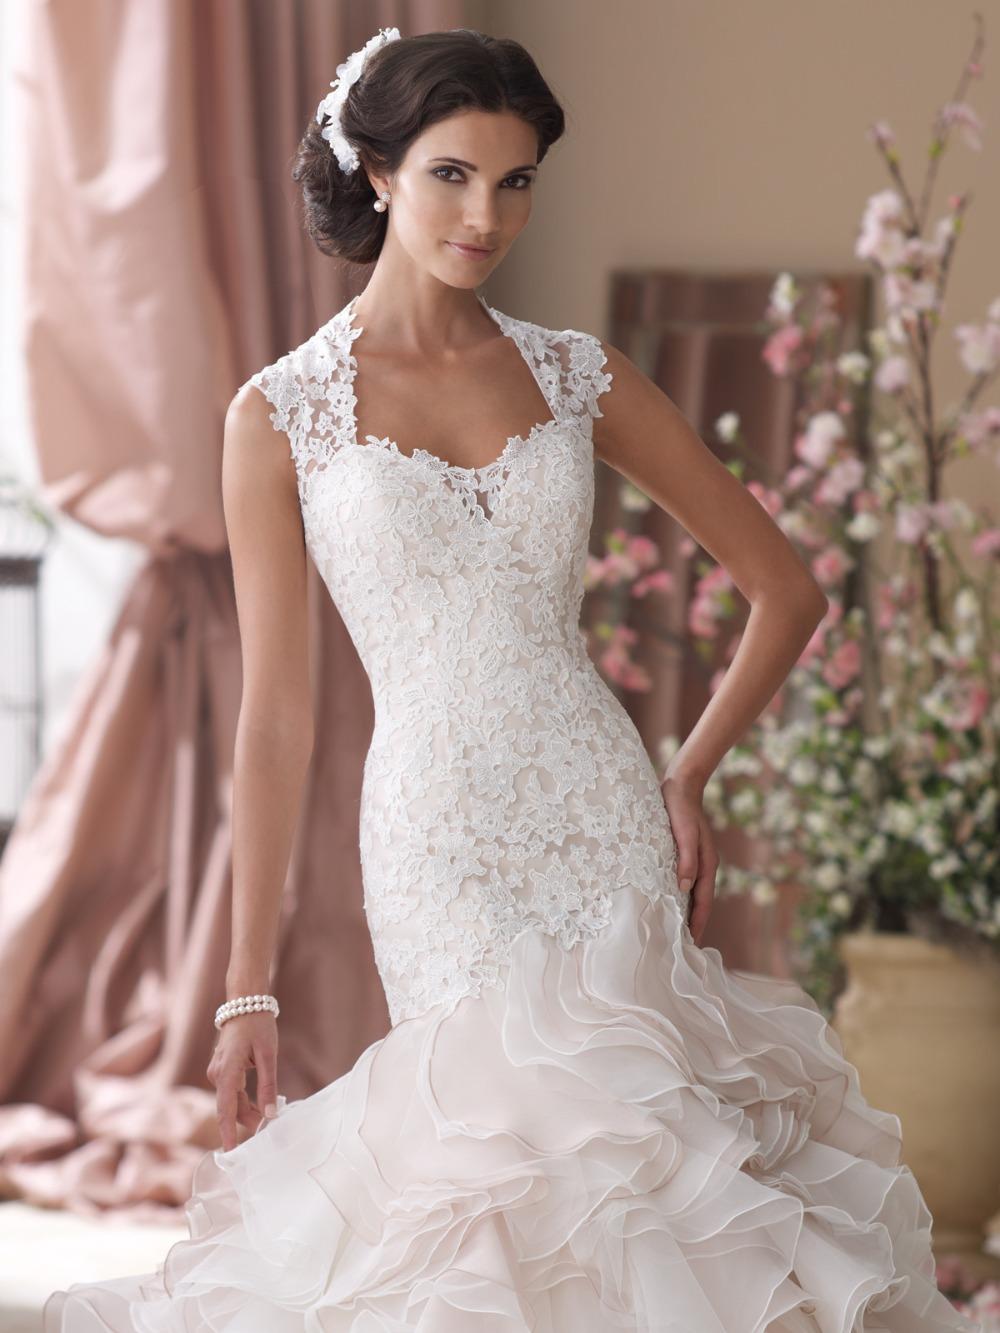 ruffle mermaid wedding gown ruffle wedding dress Satin And Lace Sweetheart Court Train Mermaid Wedding Dress With Crystal